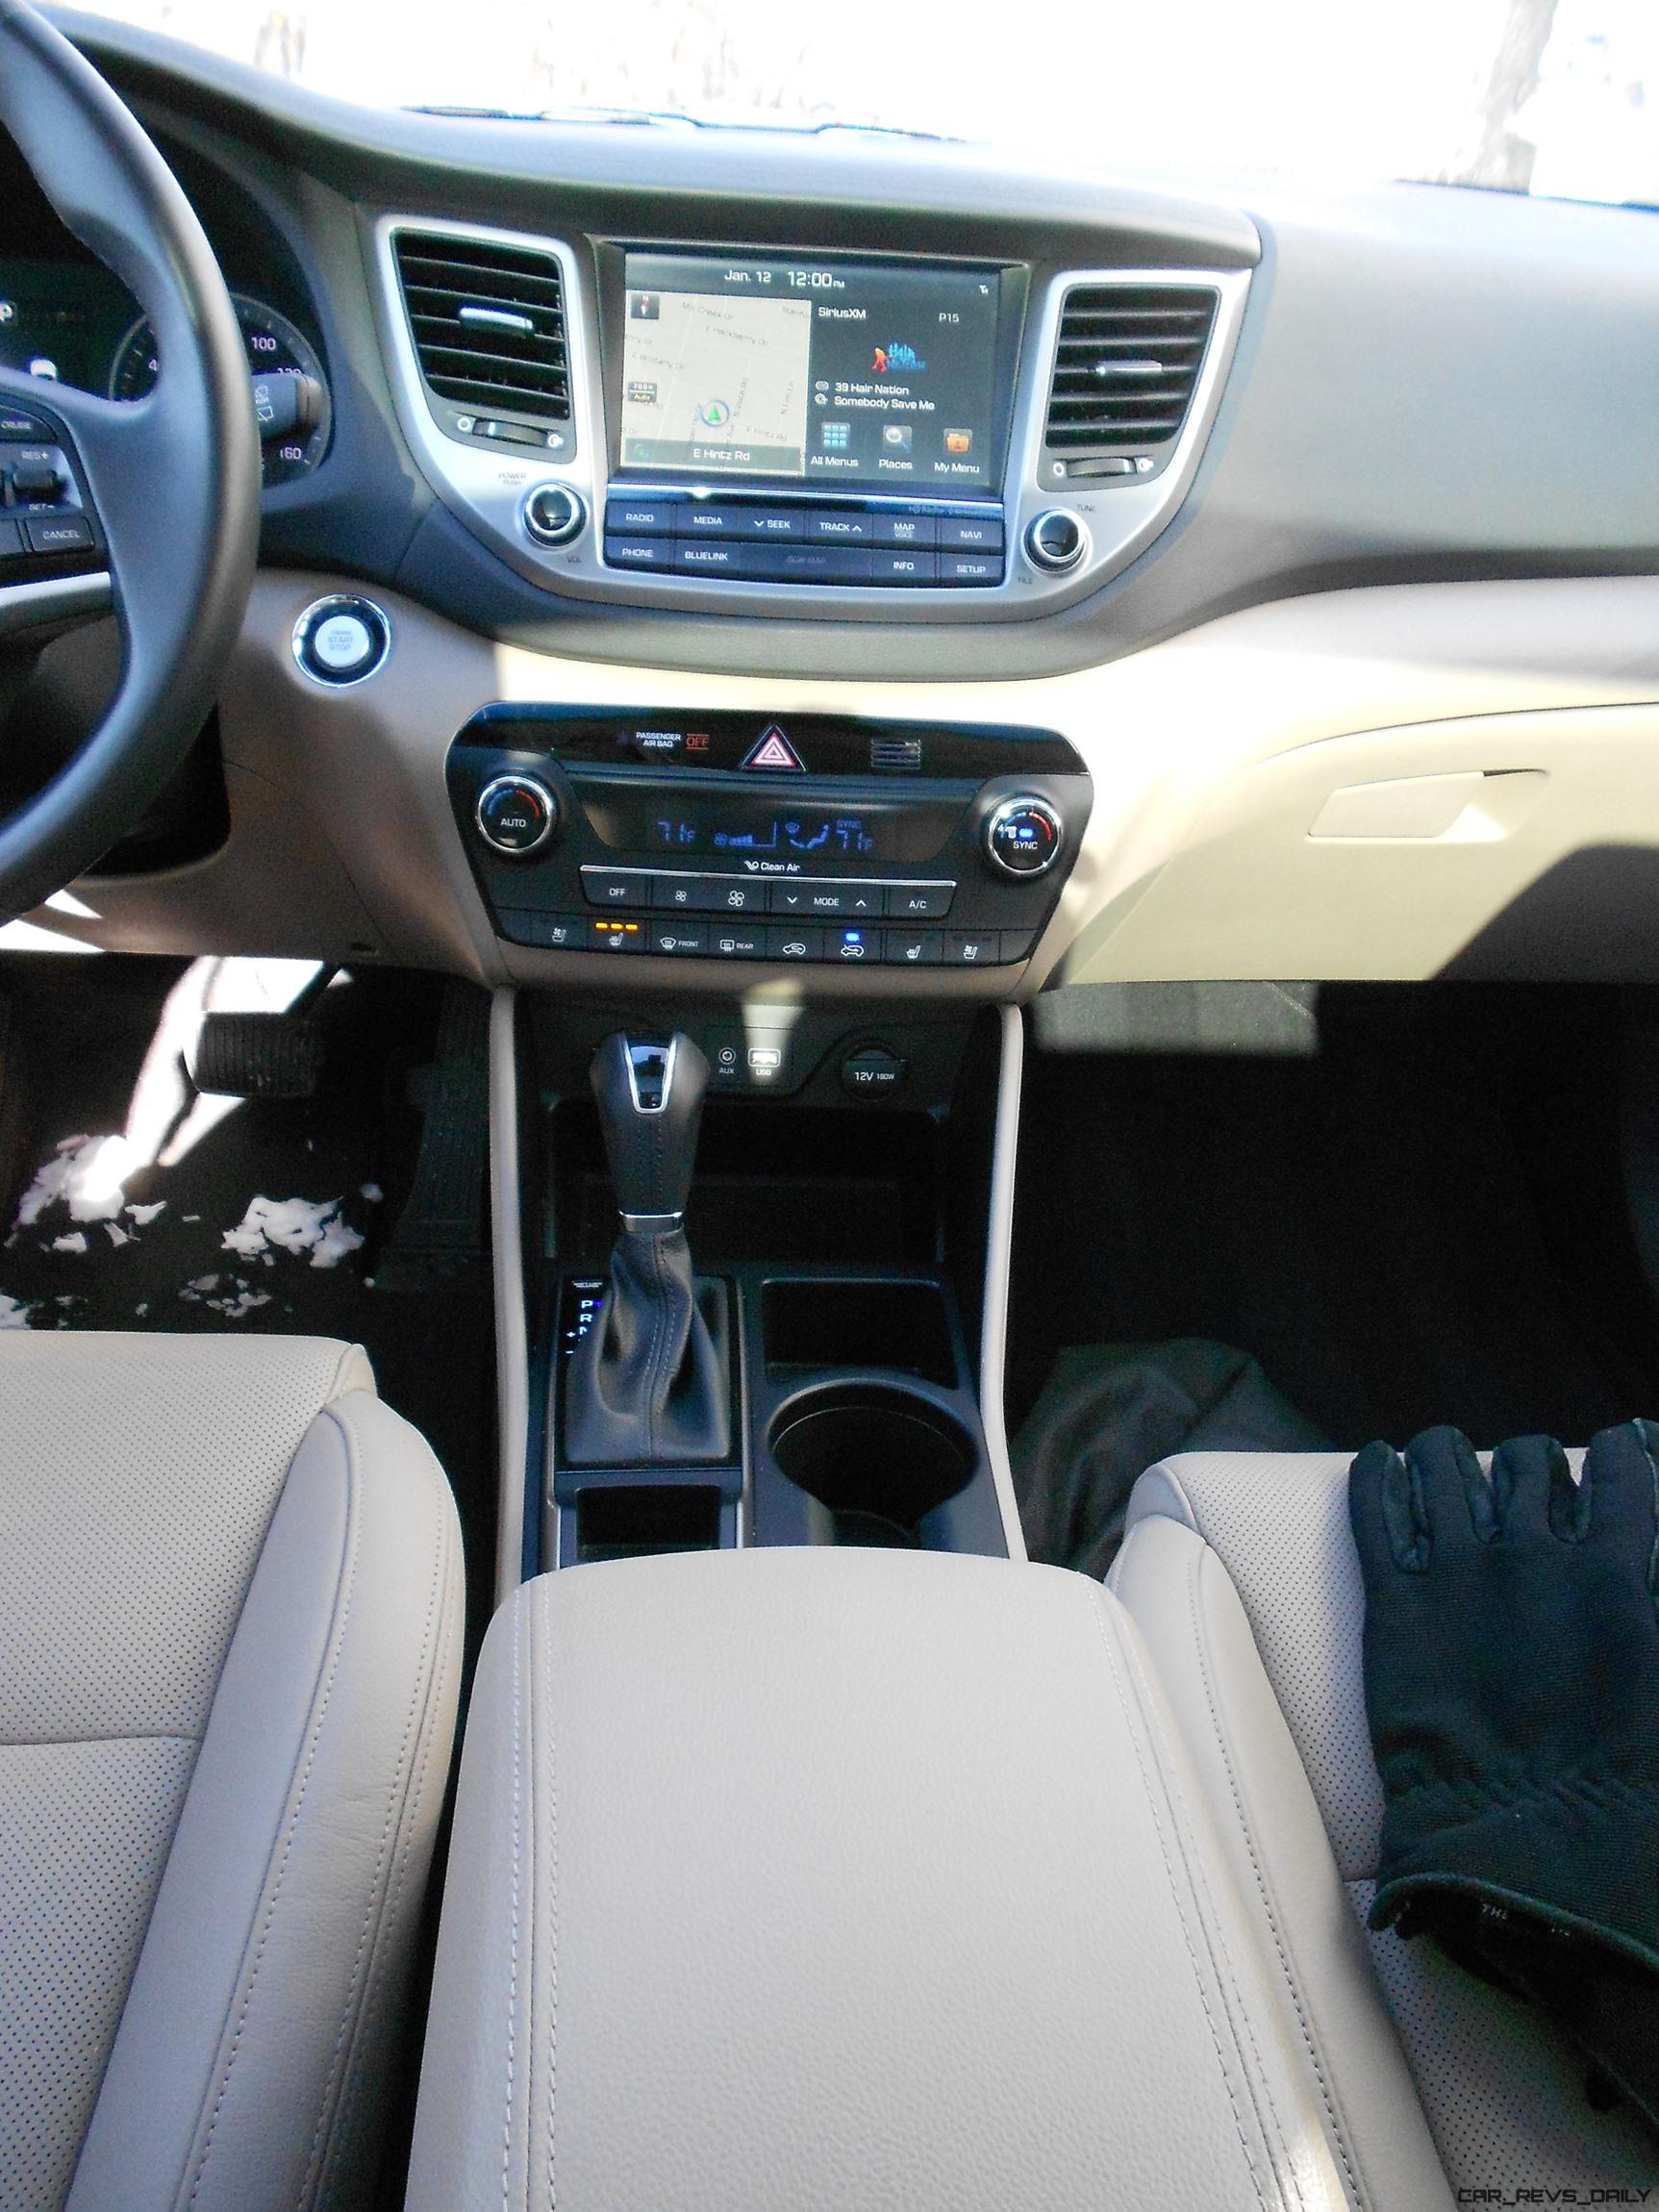 hawkeye drives 2016 hyundai tucson limited 1 6t review car revs. Black Bedroom Furniture Sets. Home Design Ideas